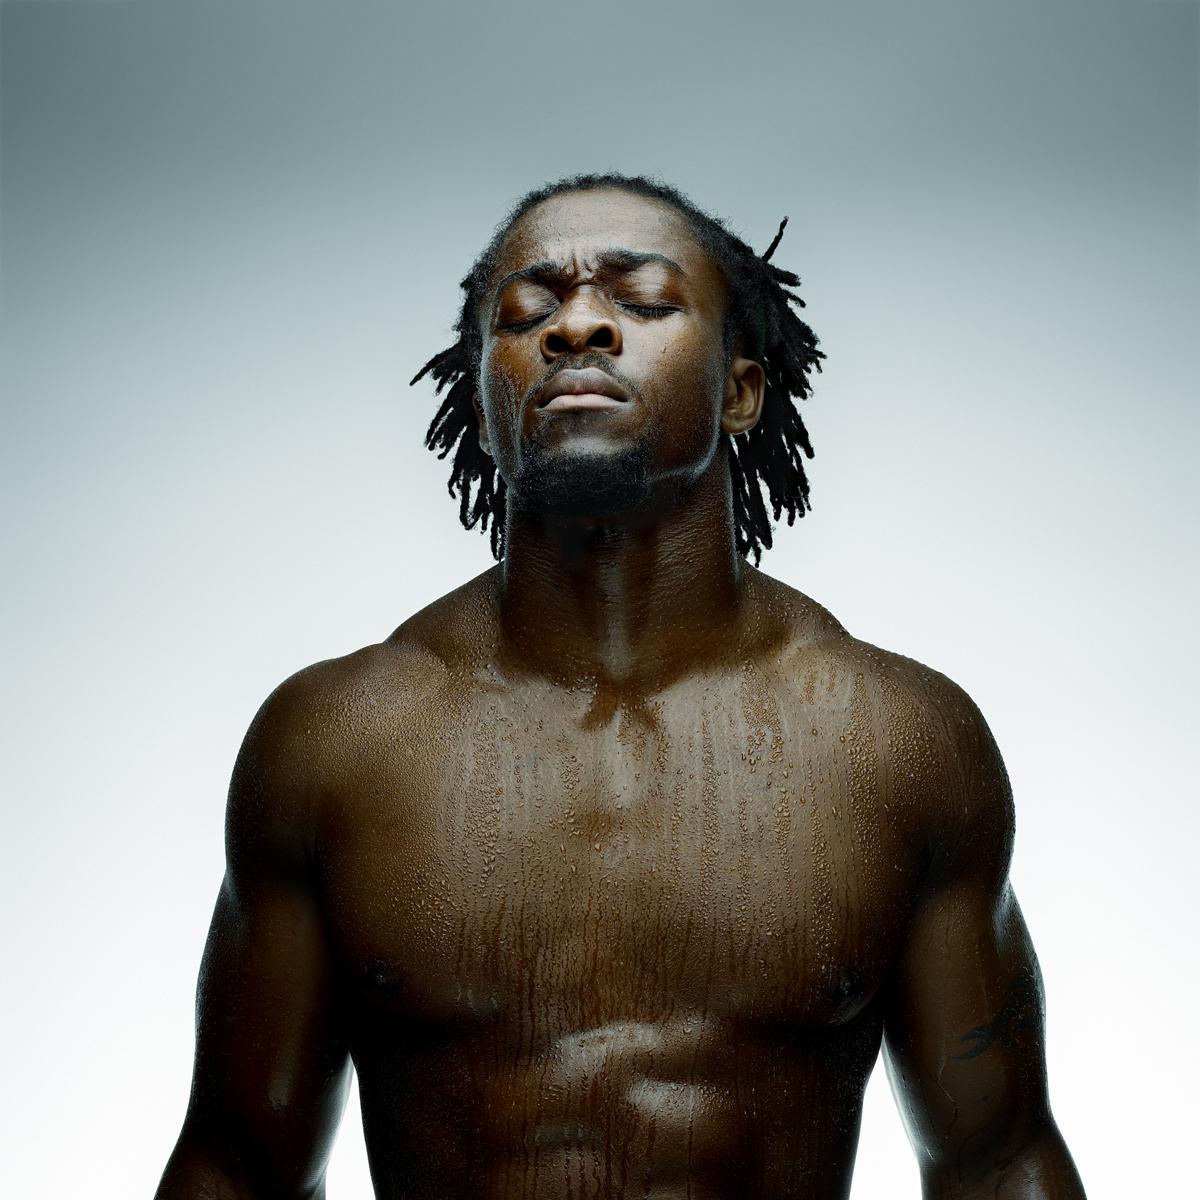 professional wrestler Kofi Kingston - age: 35